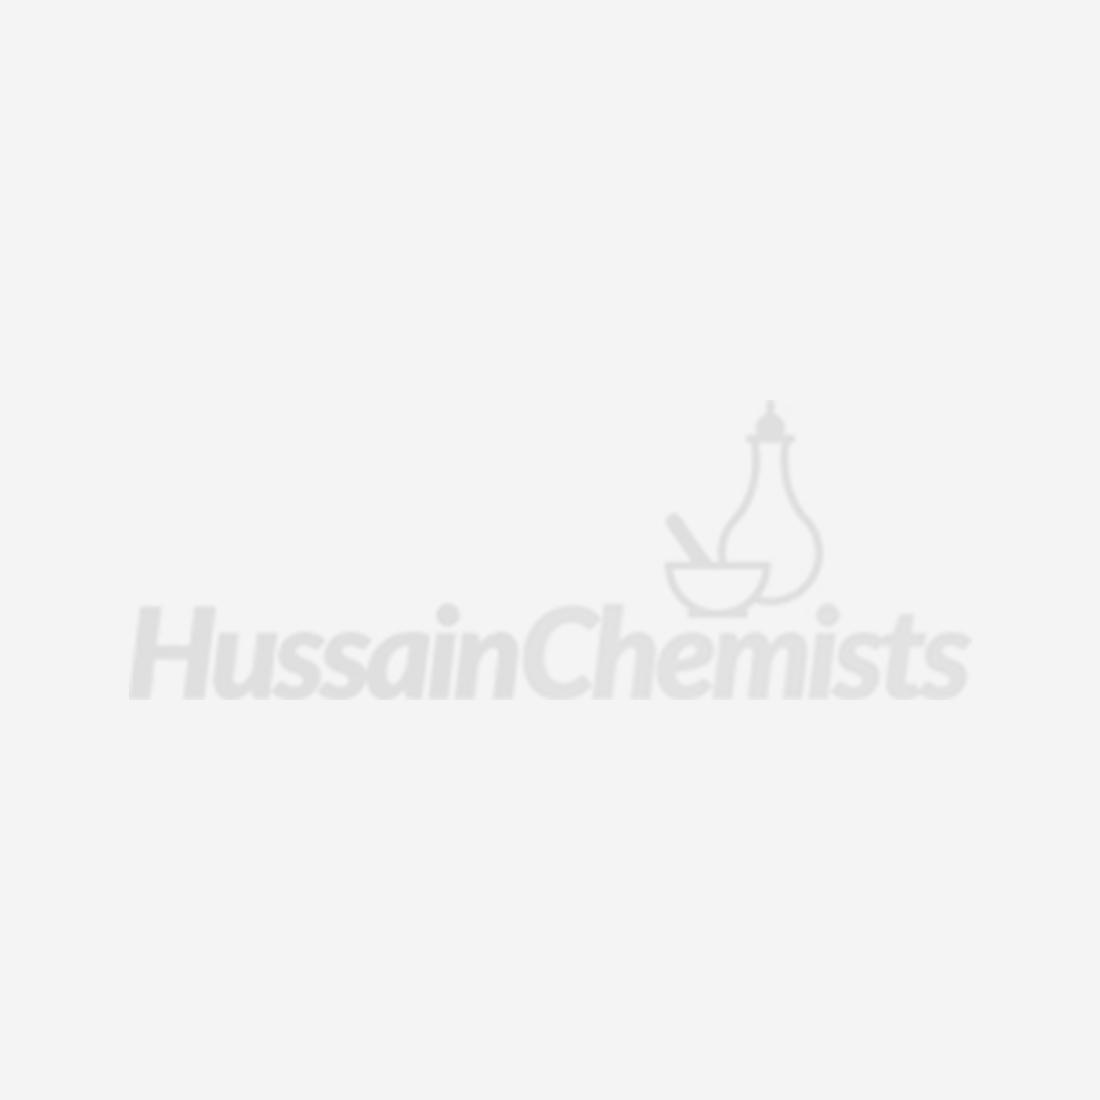 GENERIC HYDROCORTISONE OINTMENT 1% 15G